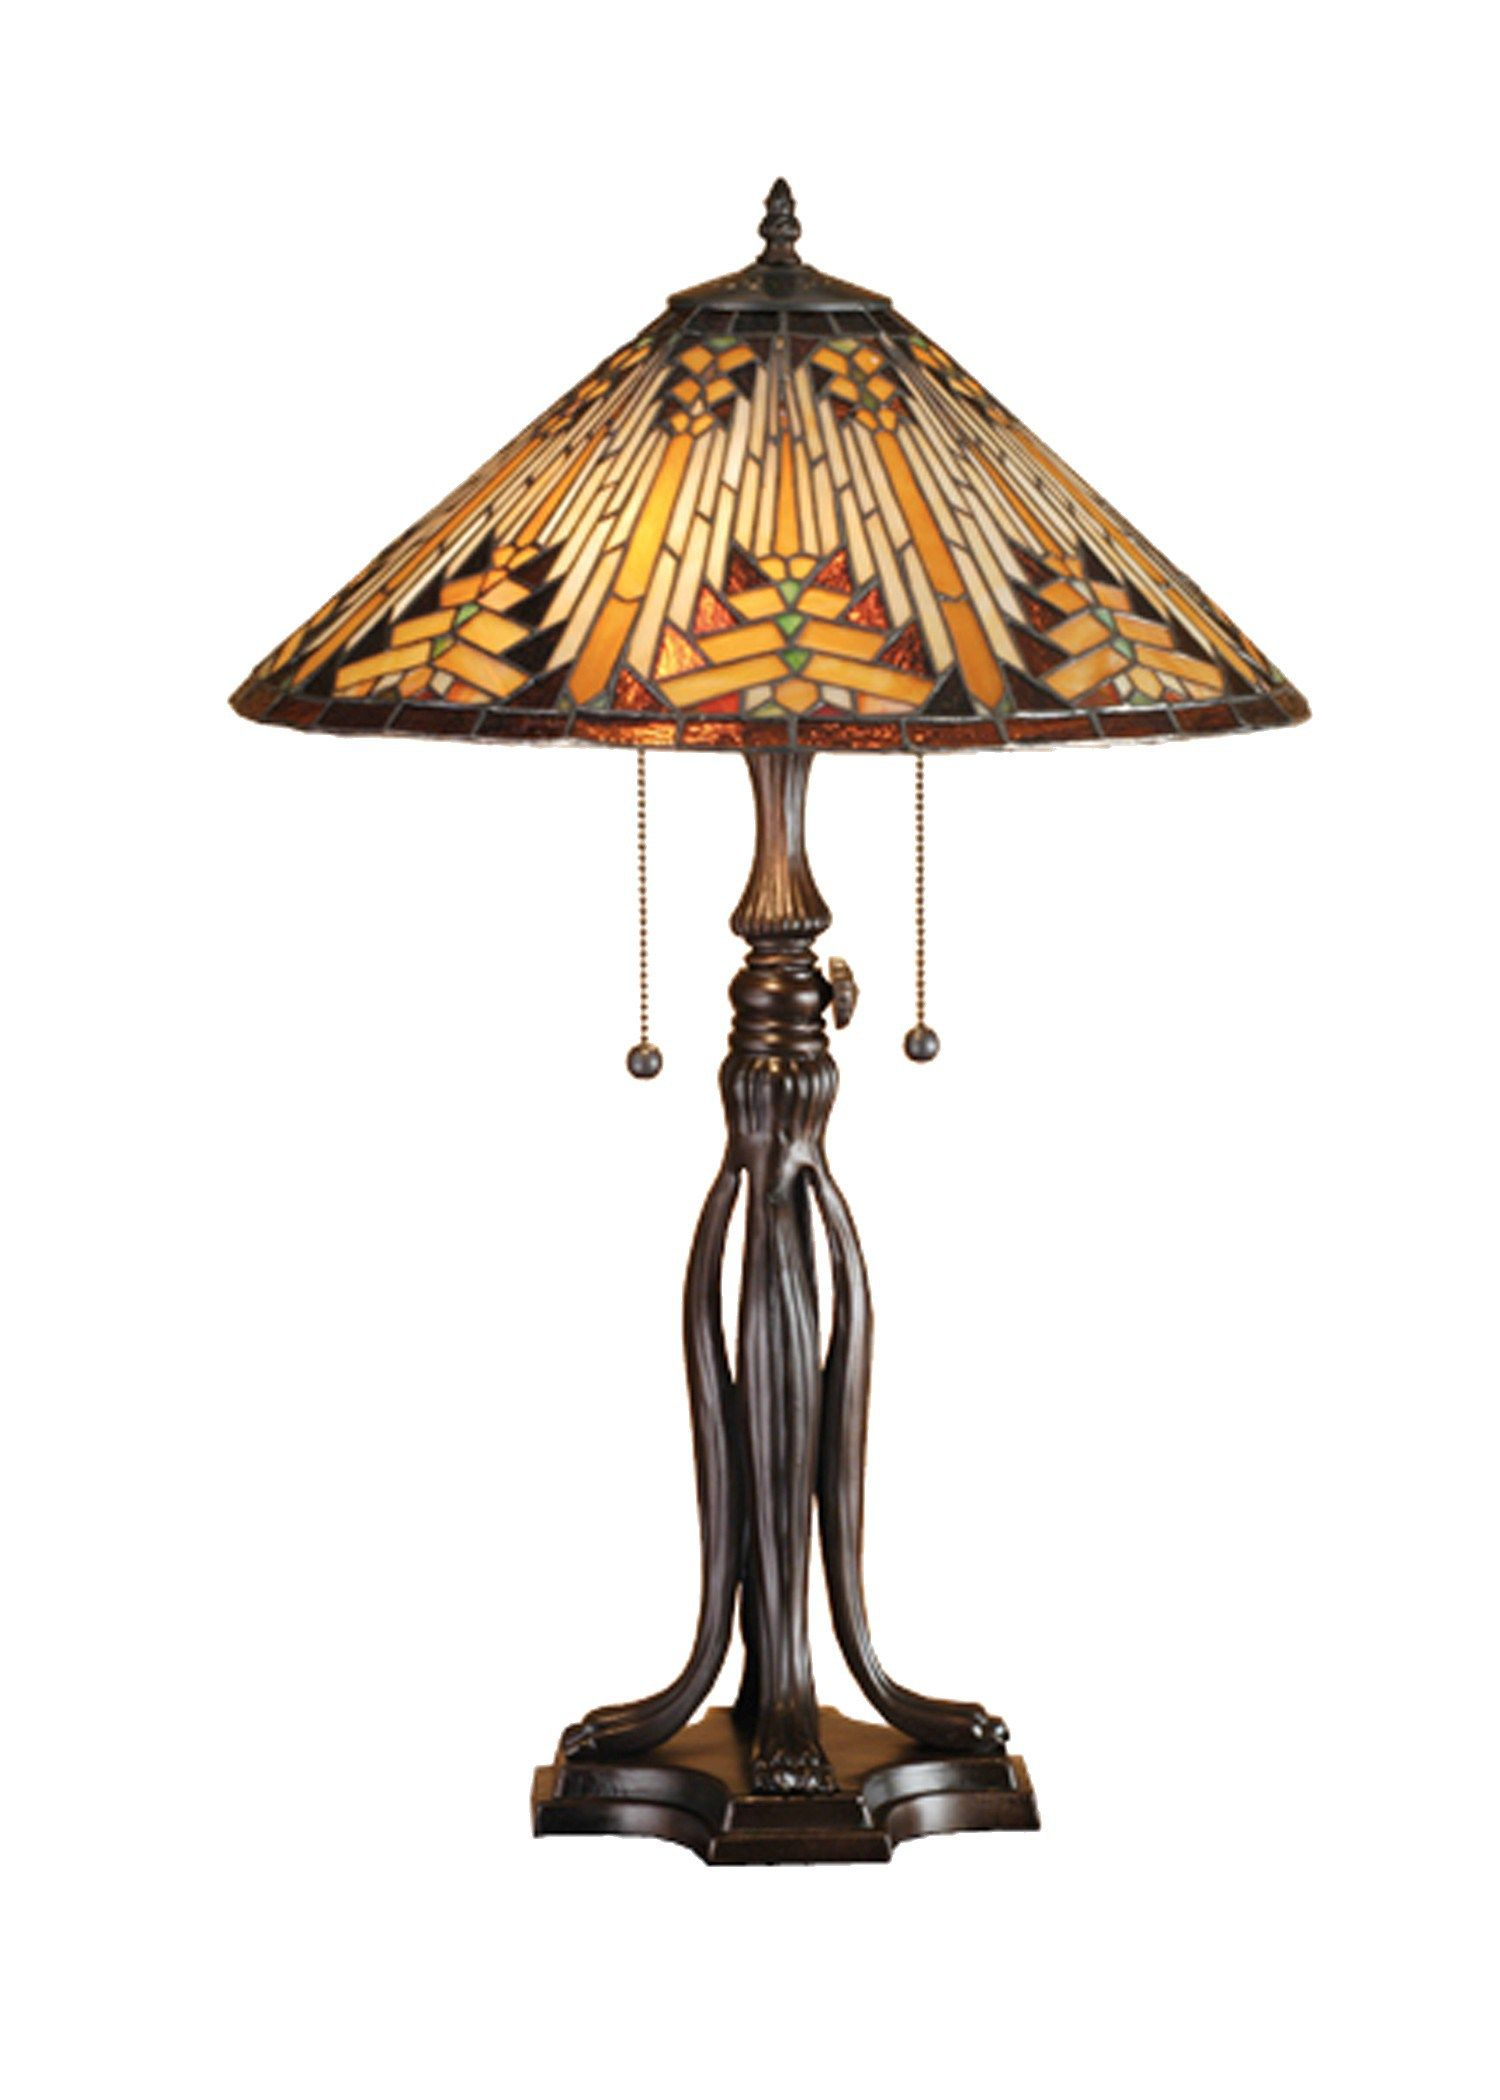 Art noveau western table lamp southwestern table lamps all kinds art noveau western table lamp southwestern table lamps aloadofball Images